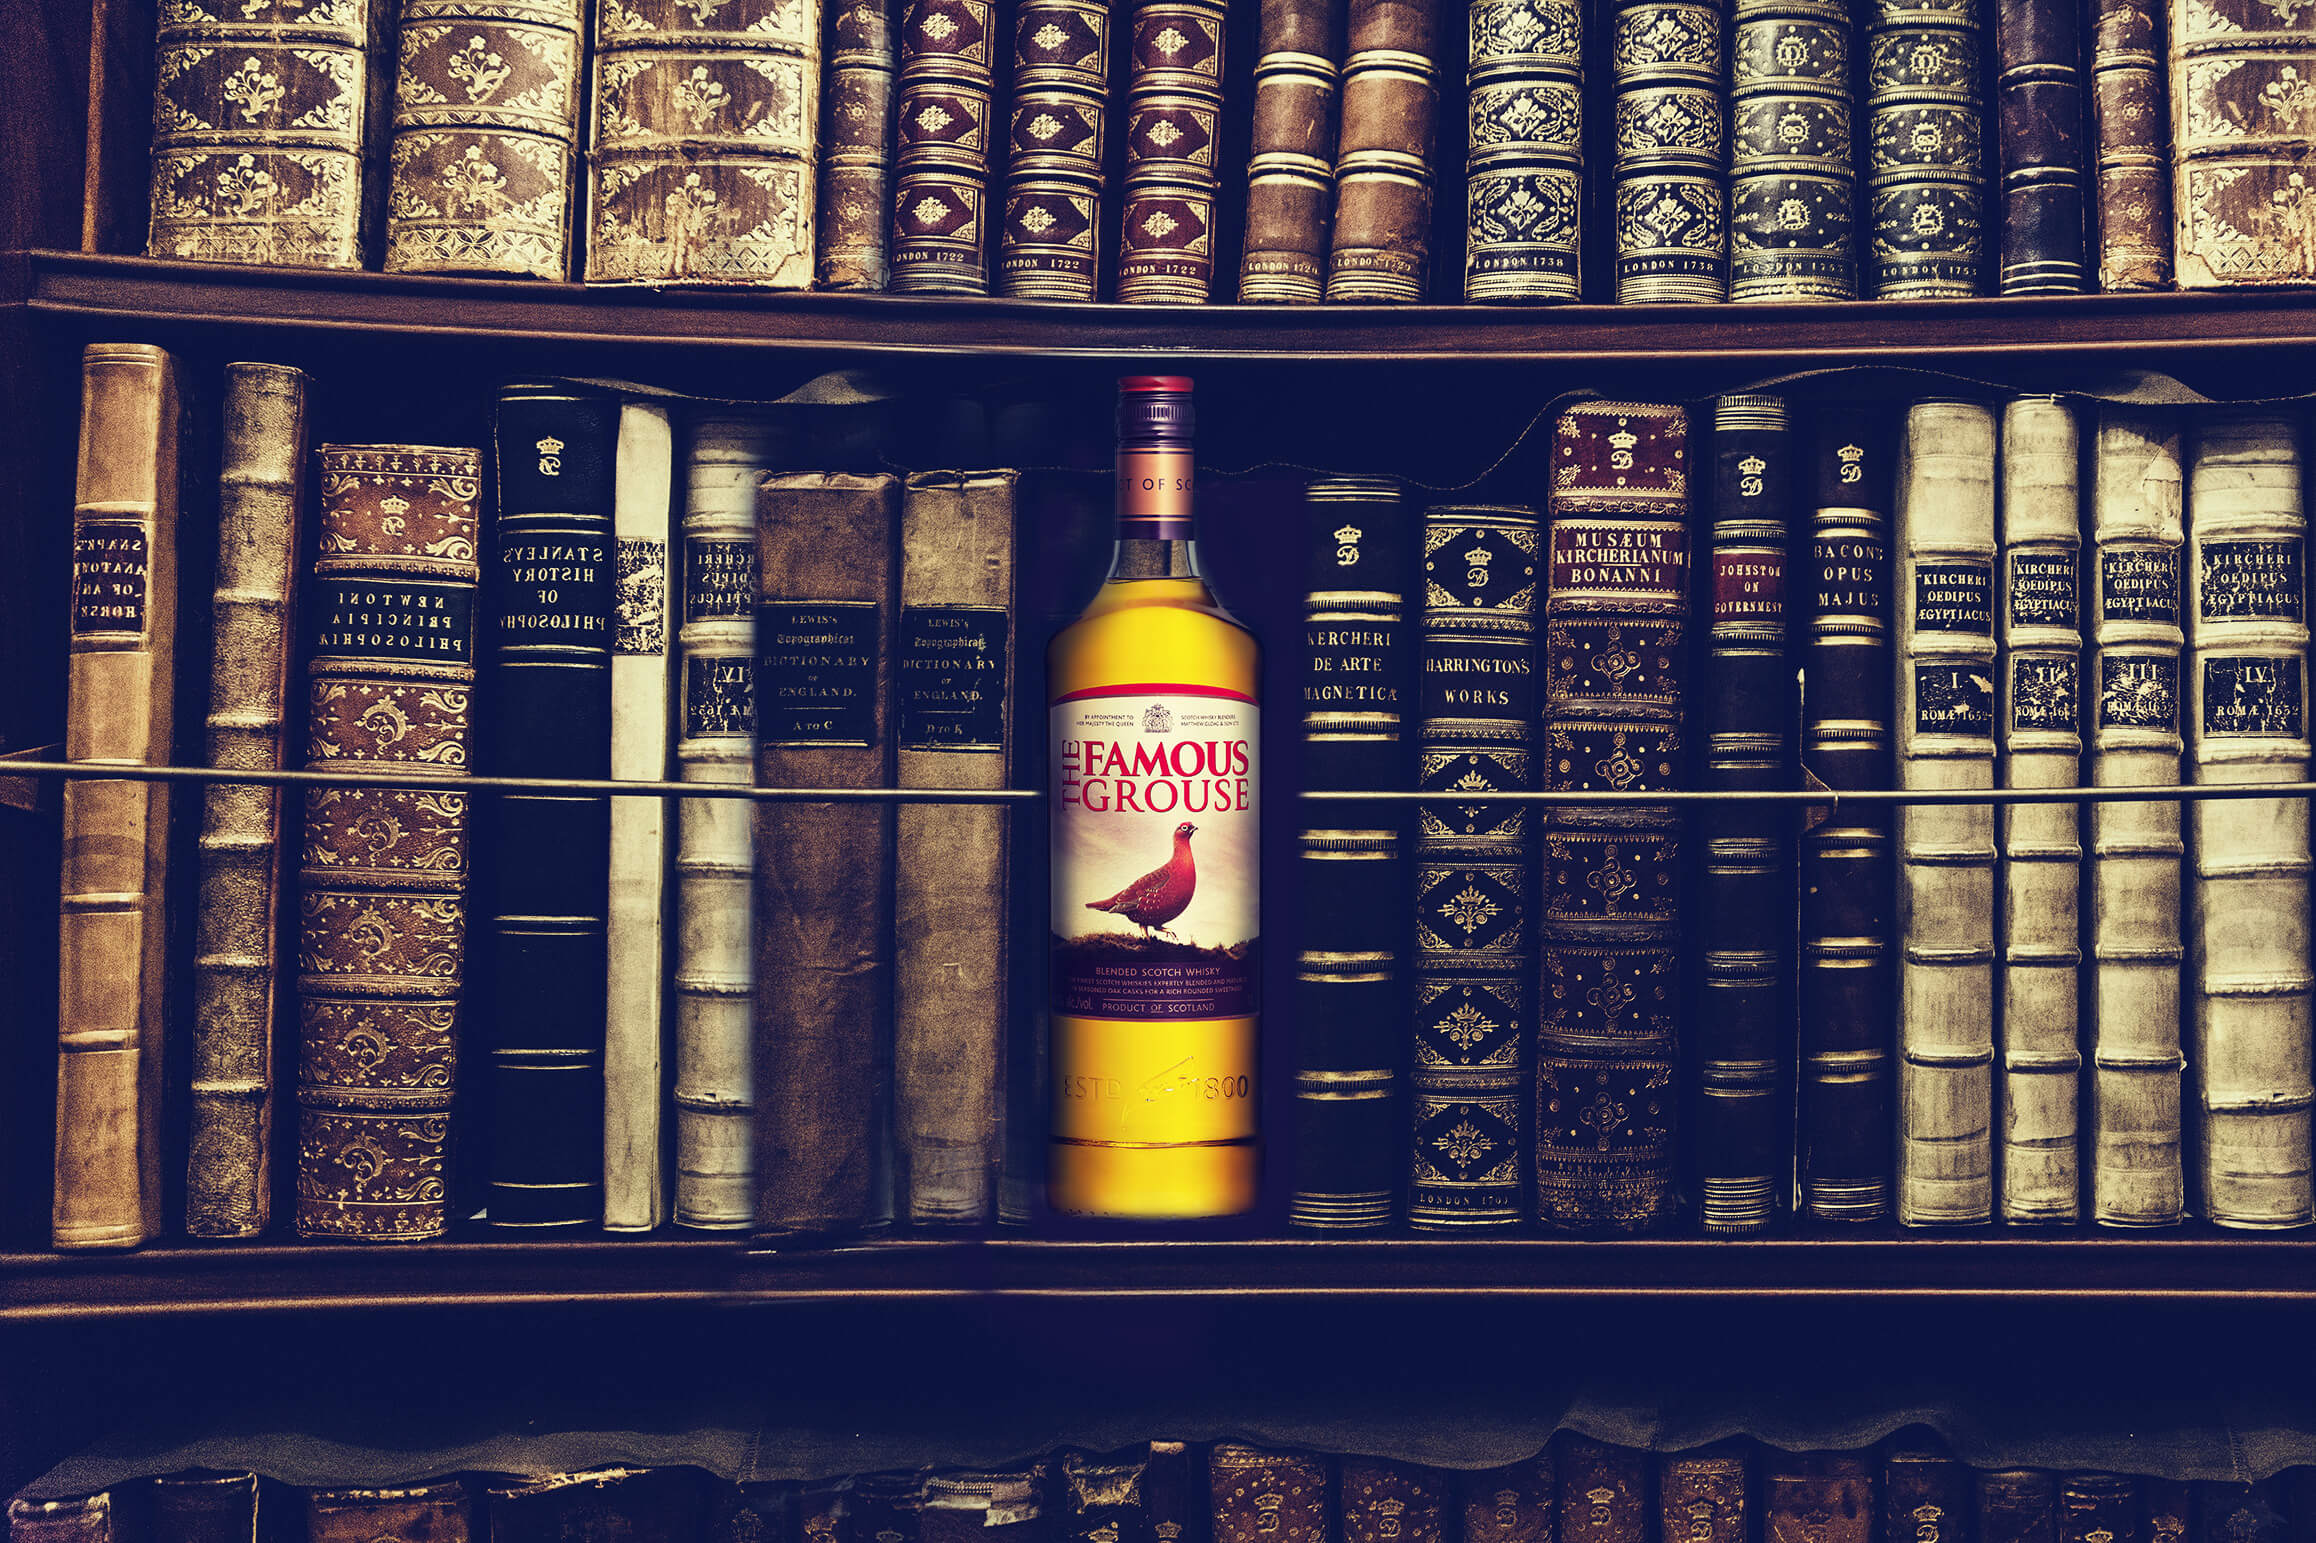 book-shelf-facebook-Famous-grouse-2